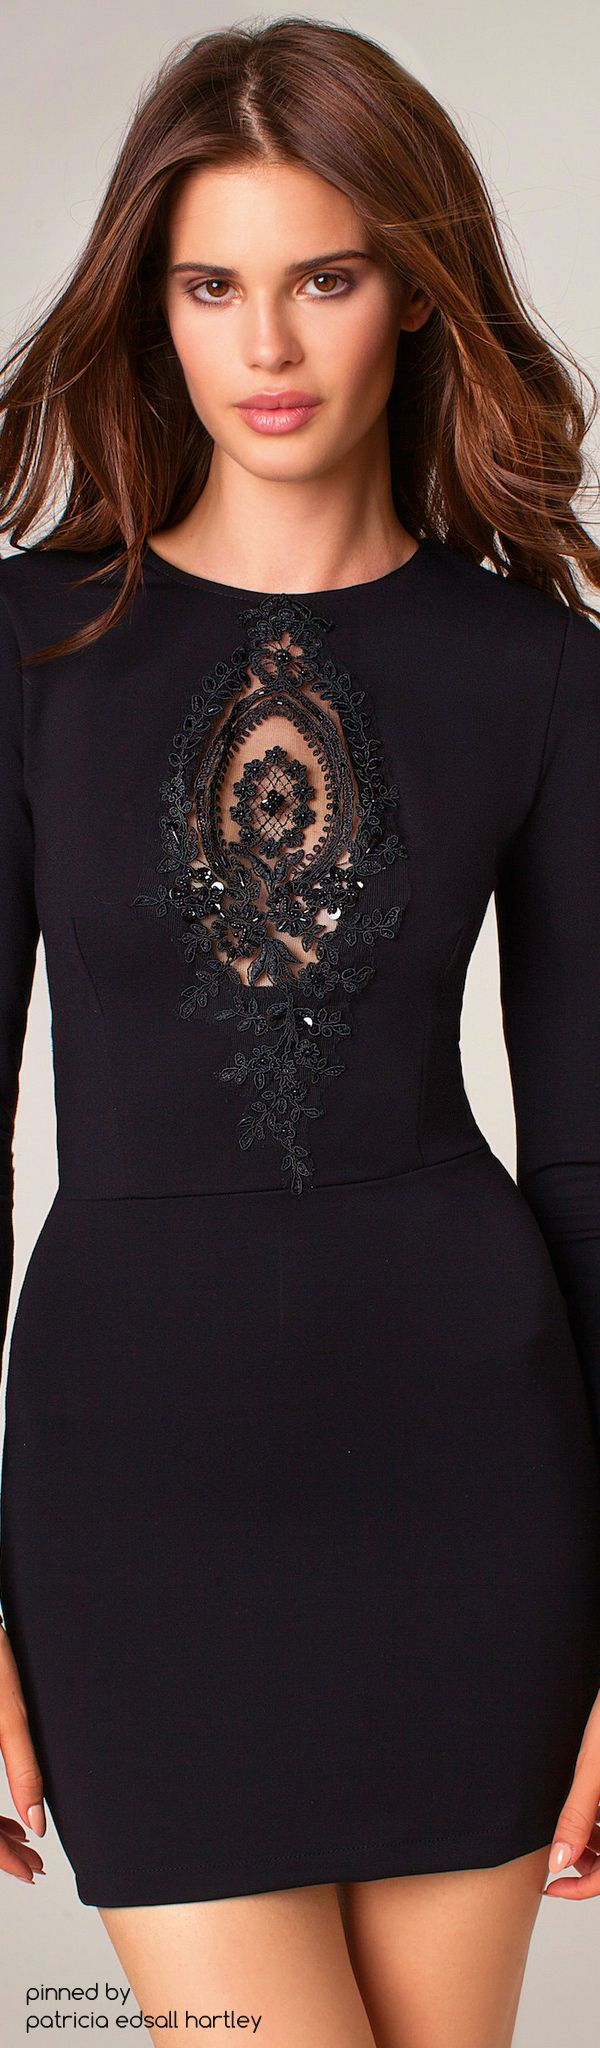 Clingy black dresses